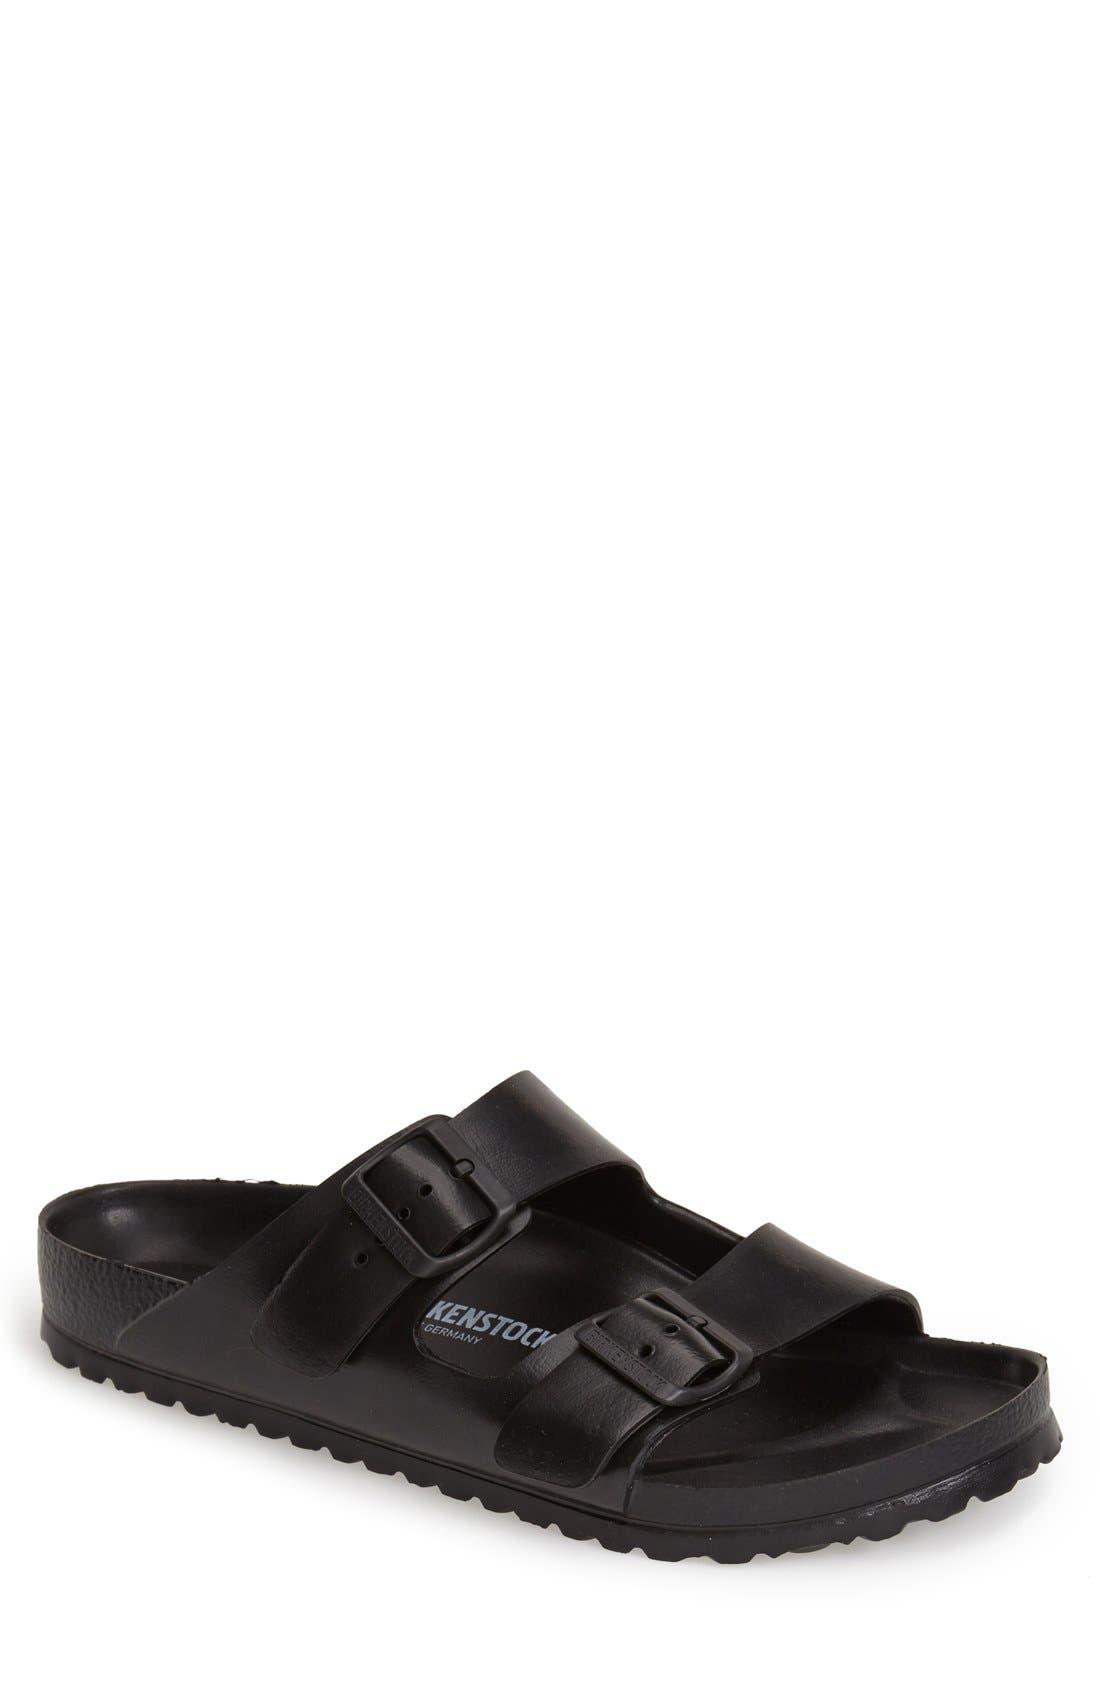 'Essentials - Arizona EVA' Waterproof Slide Sandal,                         Main,                         color, BLACK